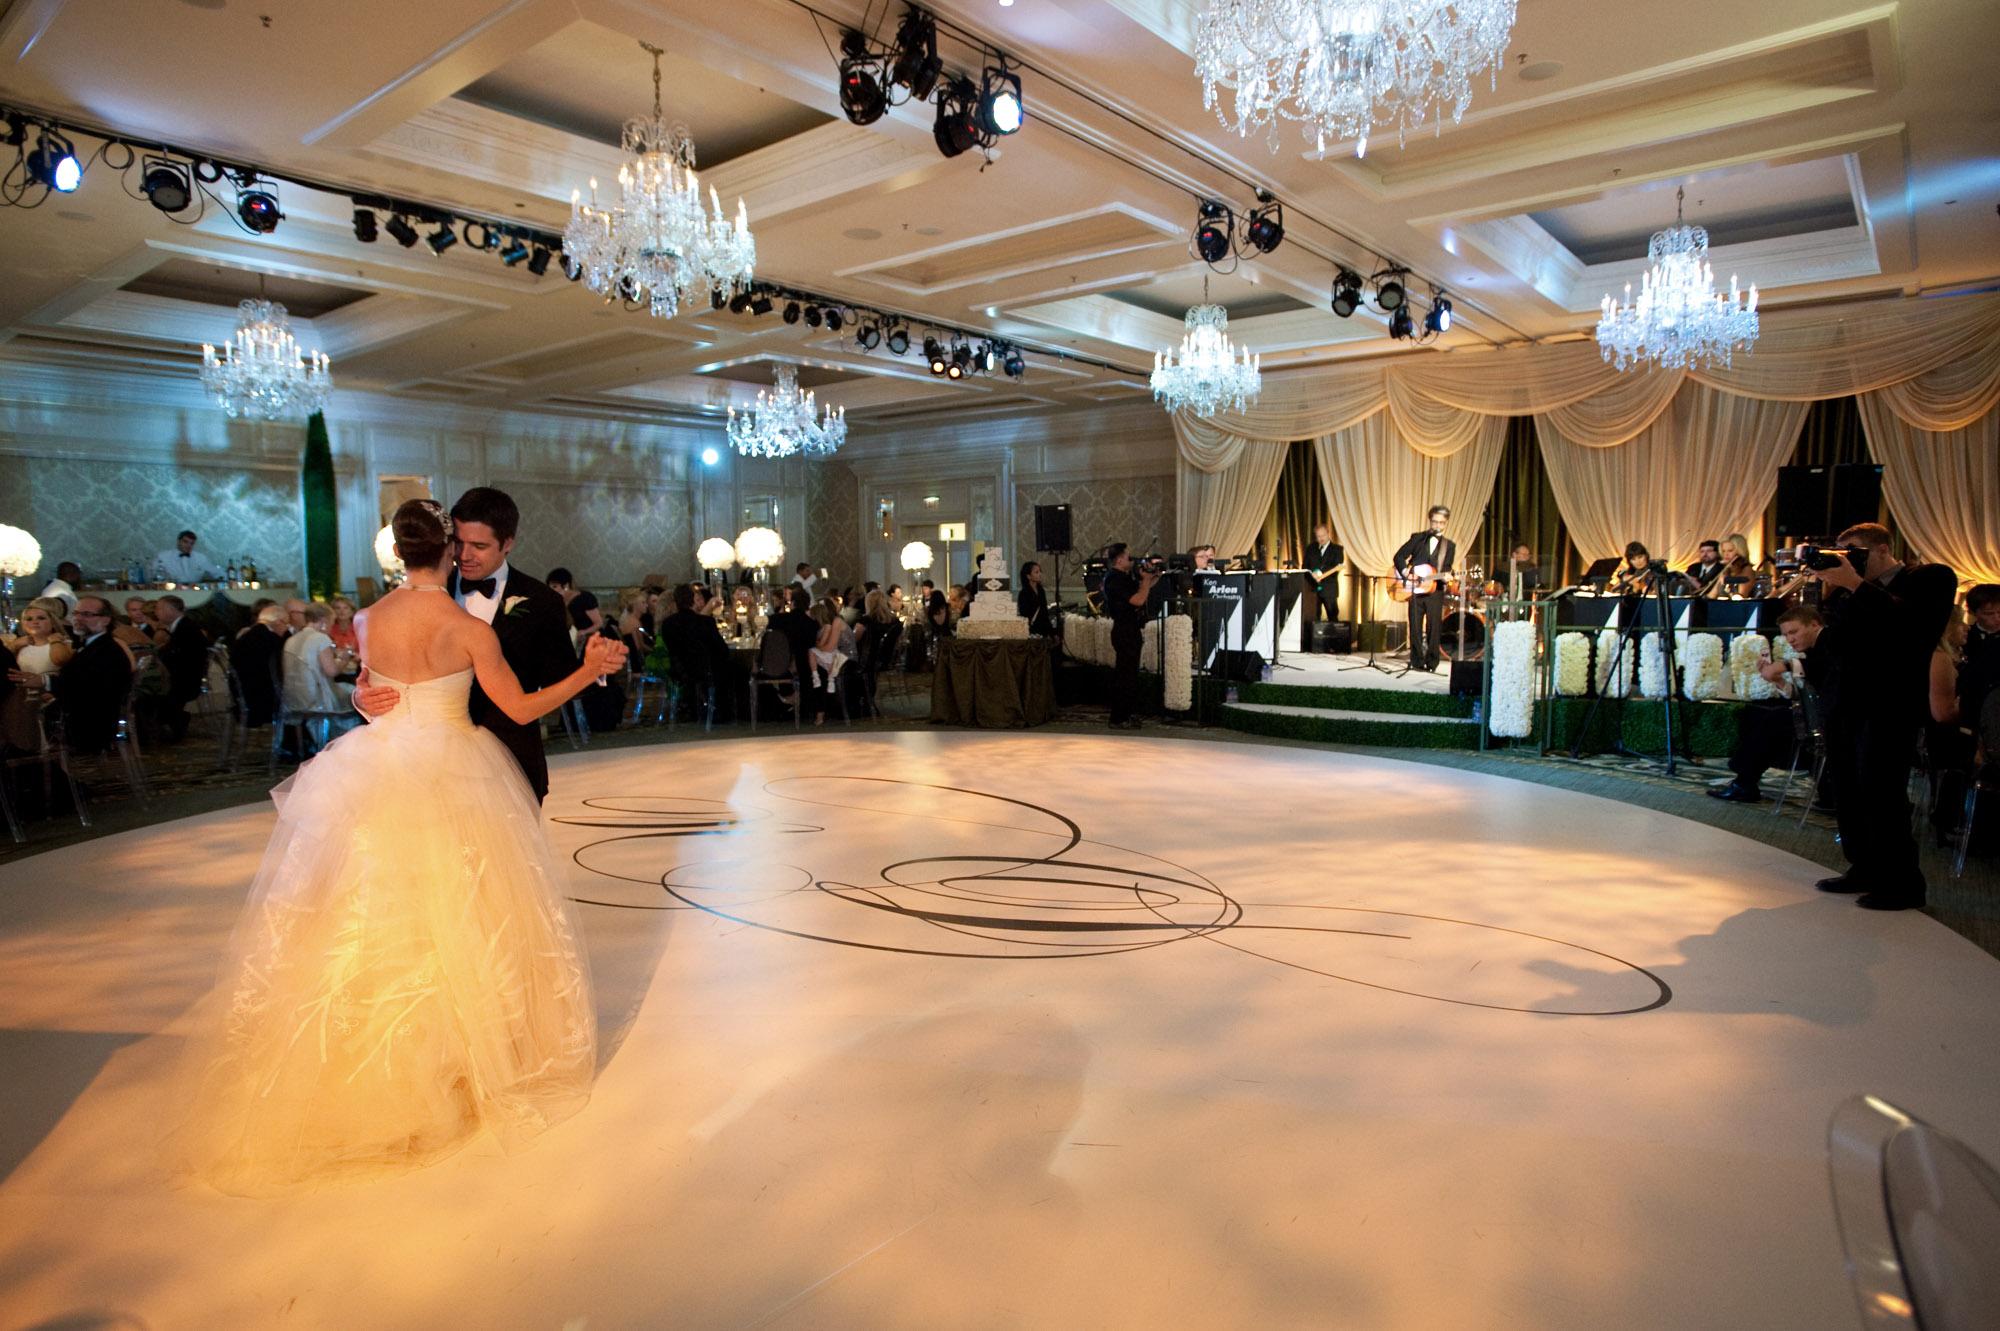 birch-bespoke-events-and-weddings-24.jpg